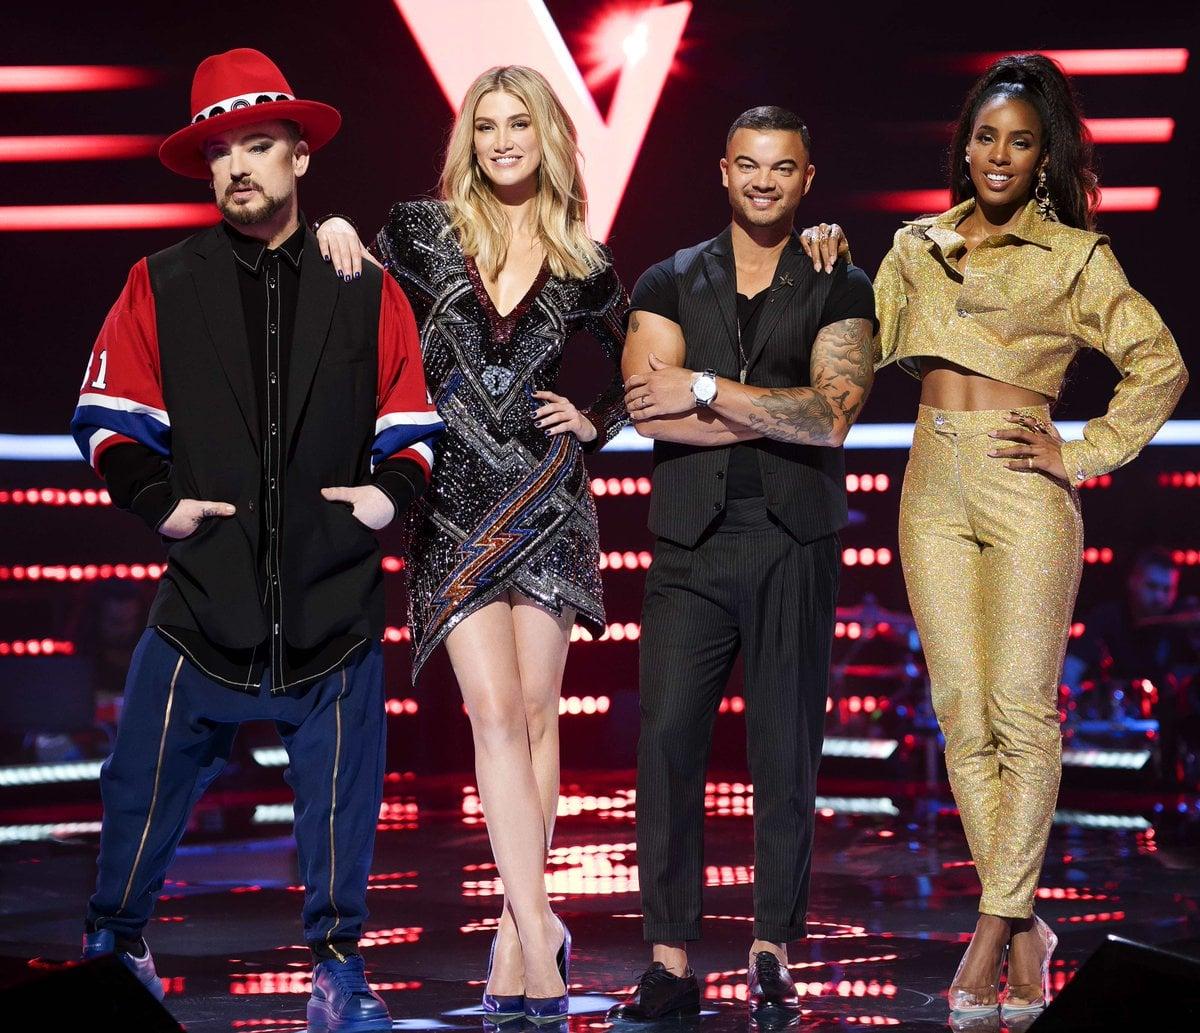 Who Are The Voice Australia 2020 Judges? | POPSUGAR Celebrity Australia